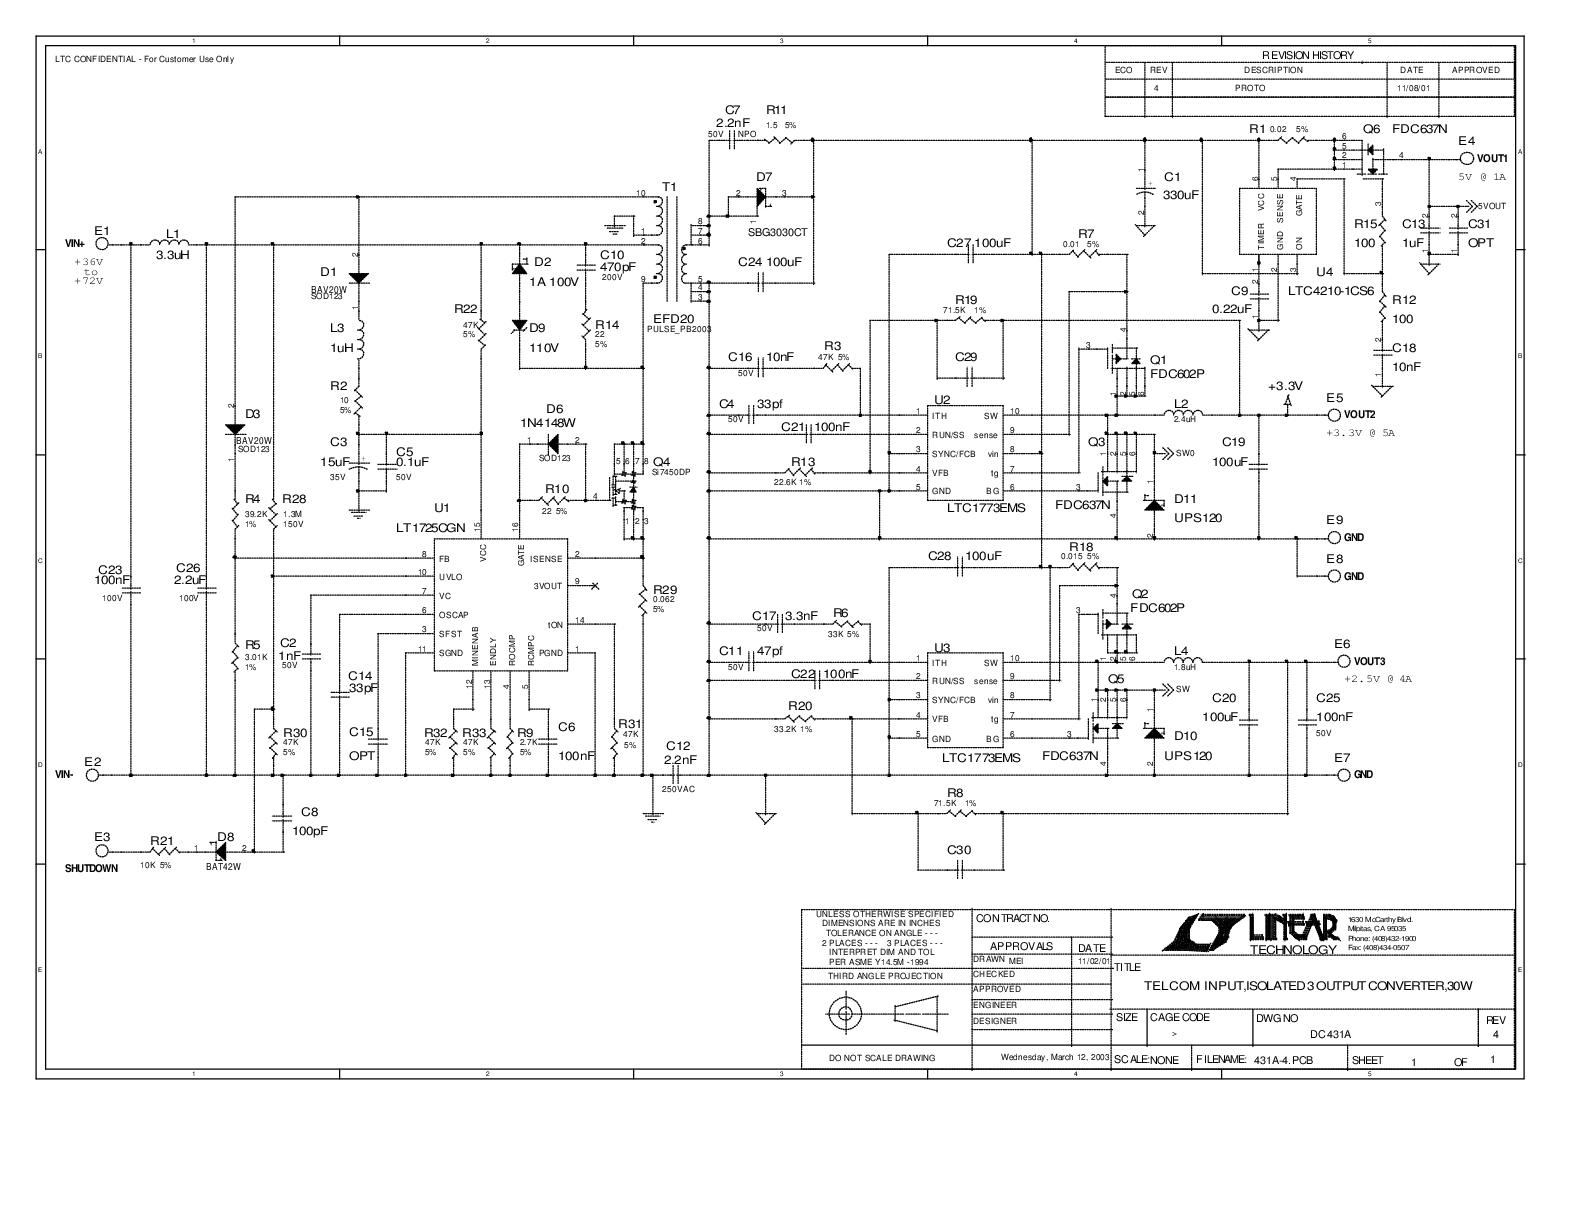 Ltc Datasheet And Product Info